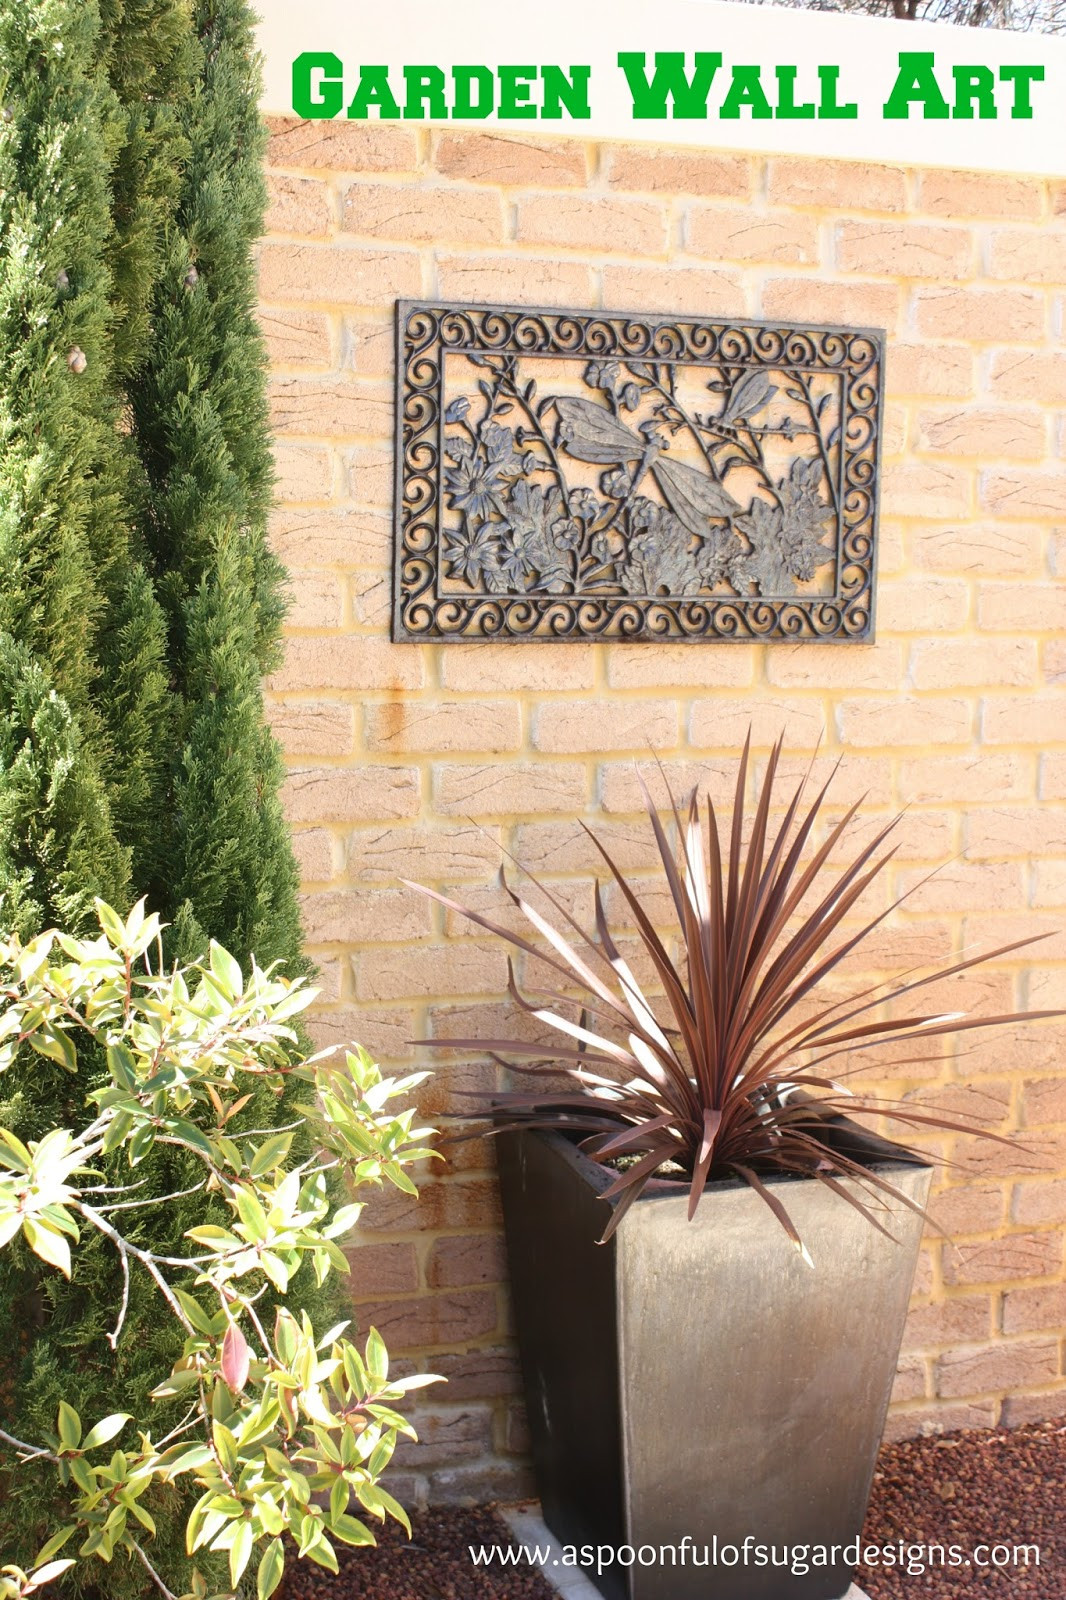 Best ideas about Garden Wall Art . Save or Pin Garden Wall Art A Spoonful of Sugar Now.